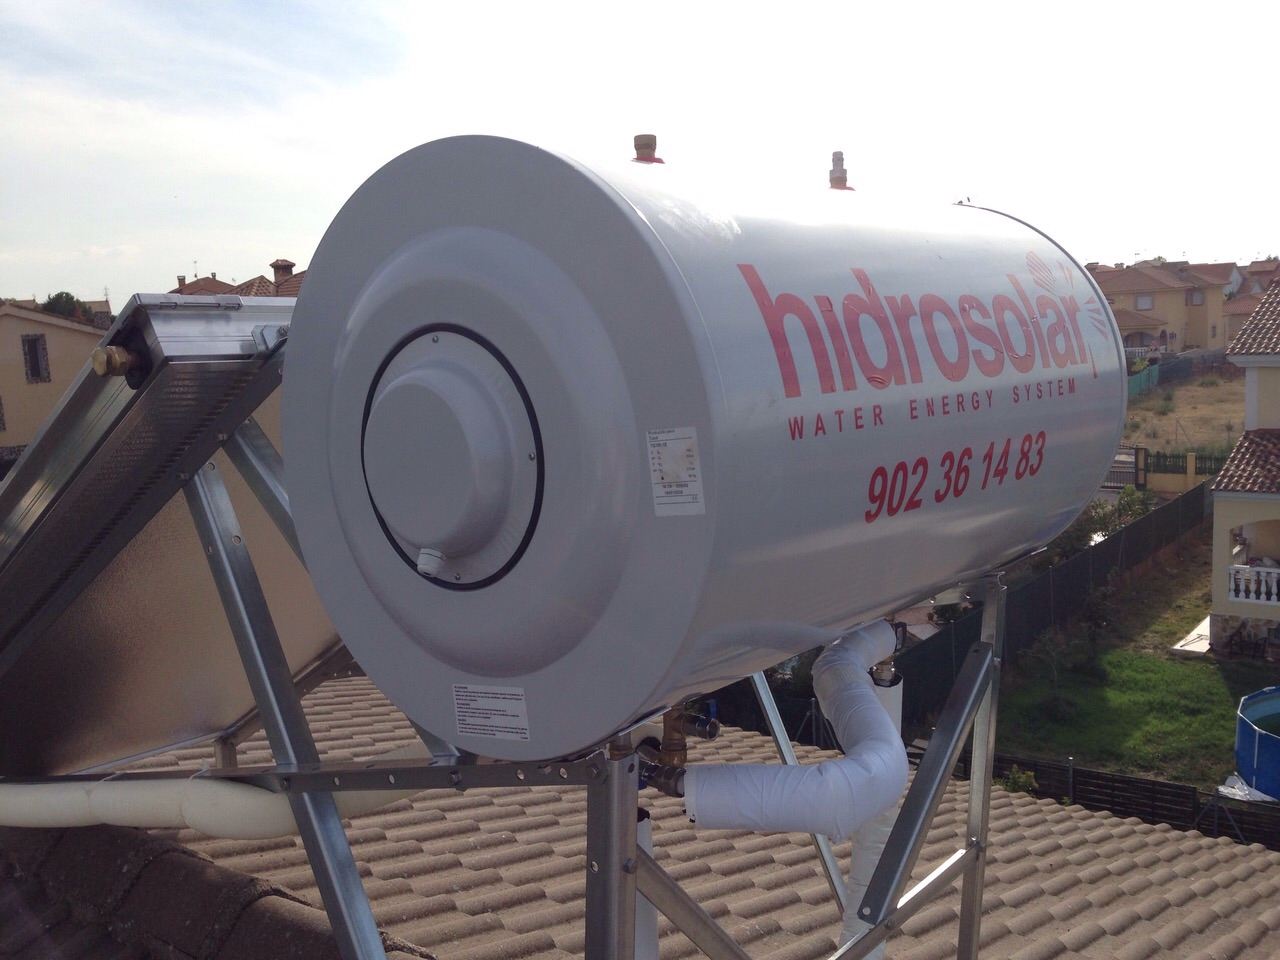 hidrosolar energia solar